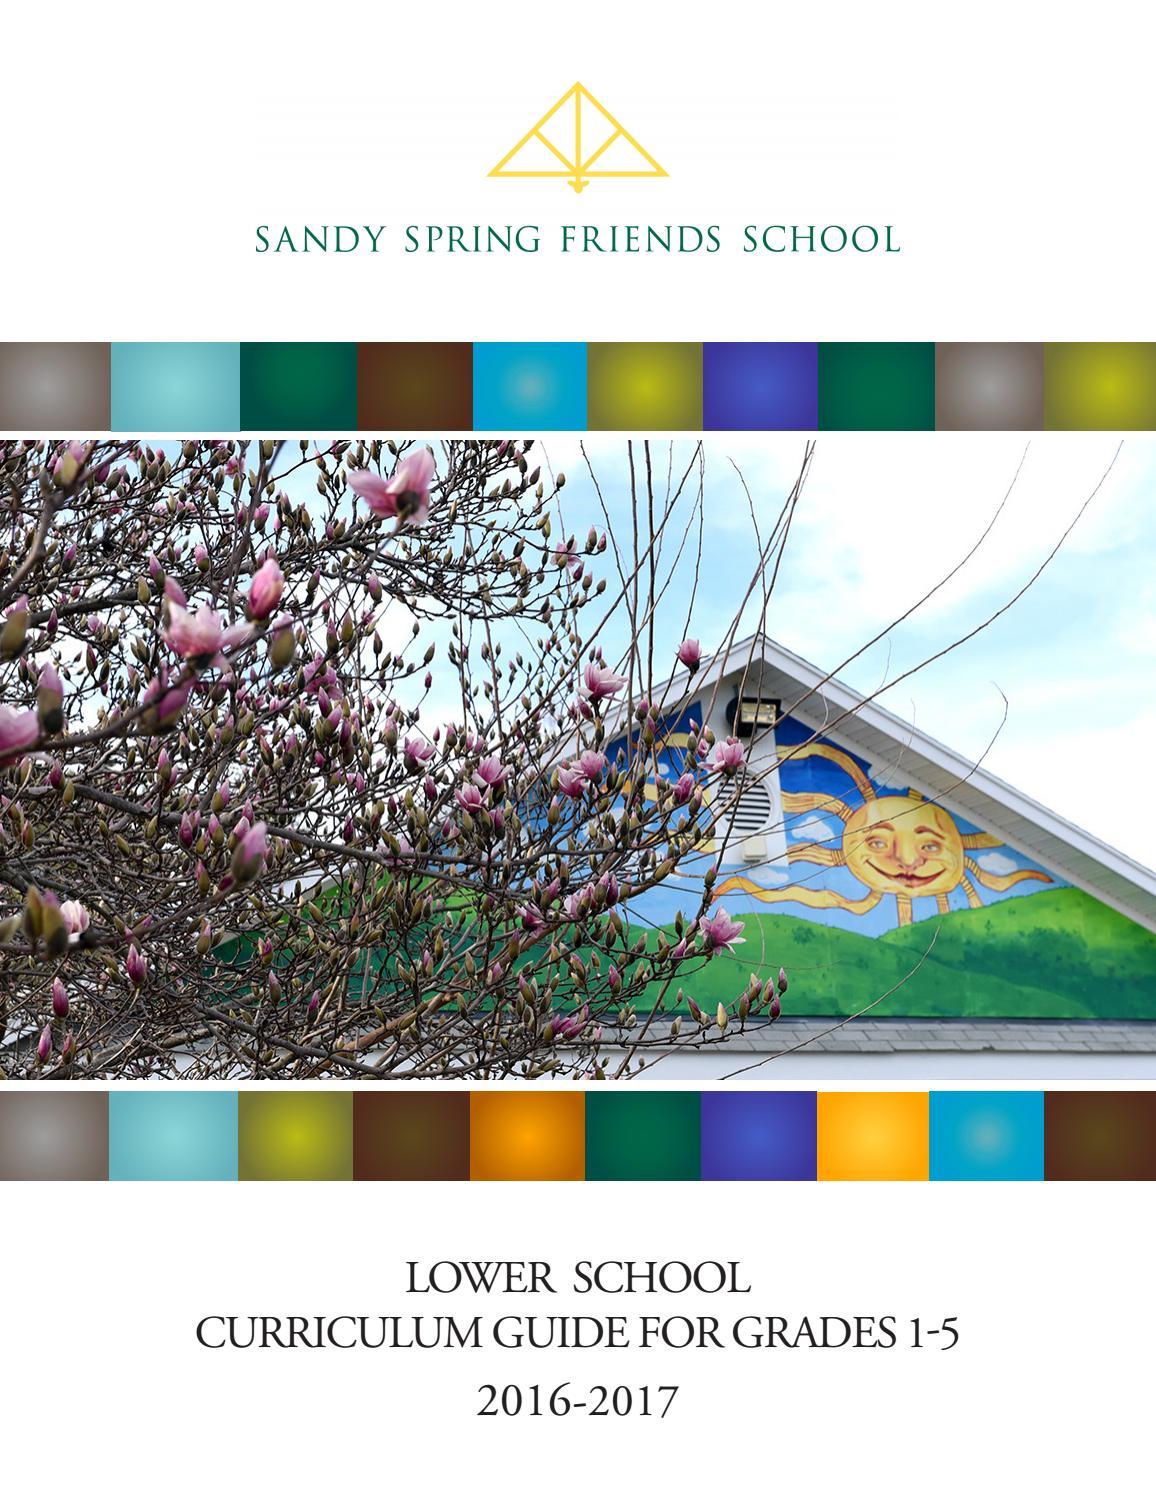 SSFS Lower School Curriculum Guide Grades 1 5 By Sandy